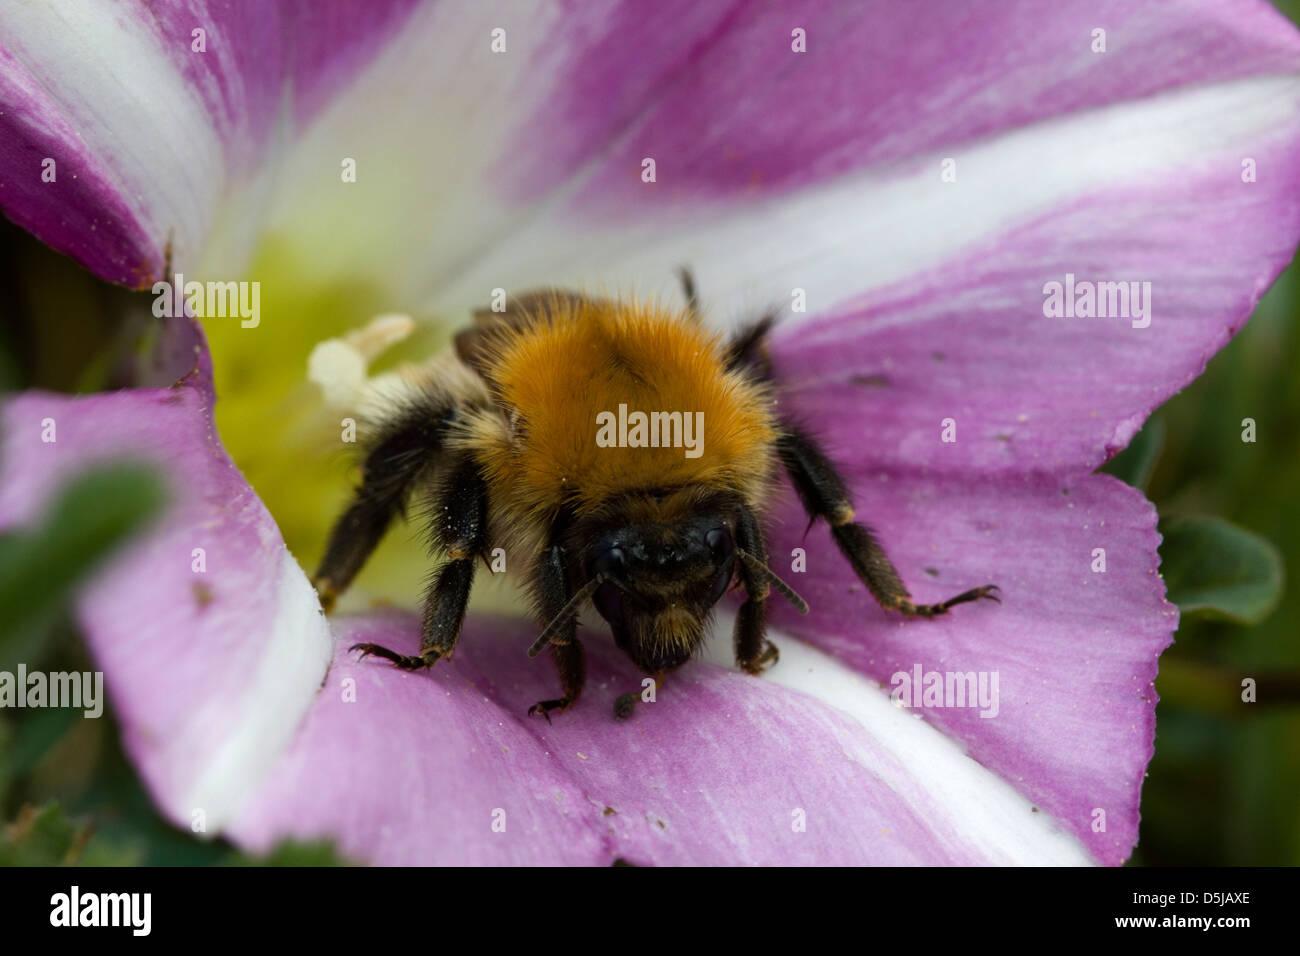 Bumble Bee in a Sea Bindweed Flower, Braunton Burrows, North Devon. Stock Photo